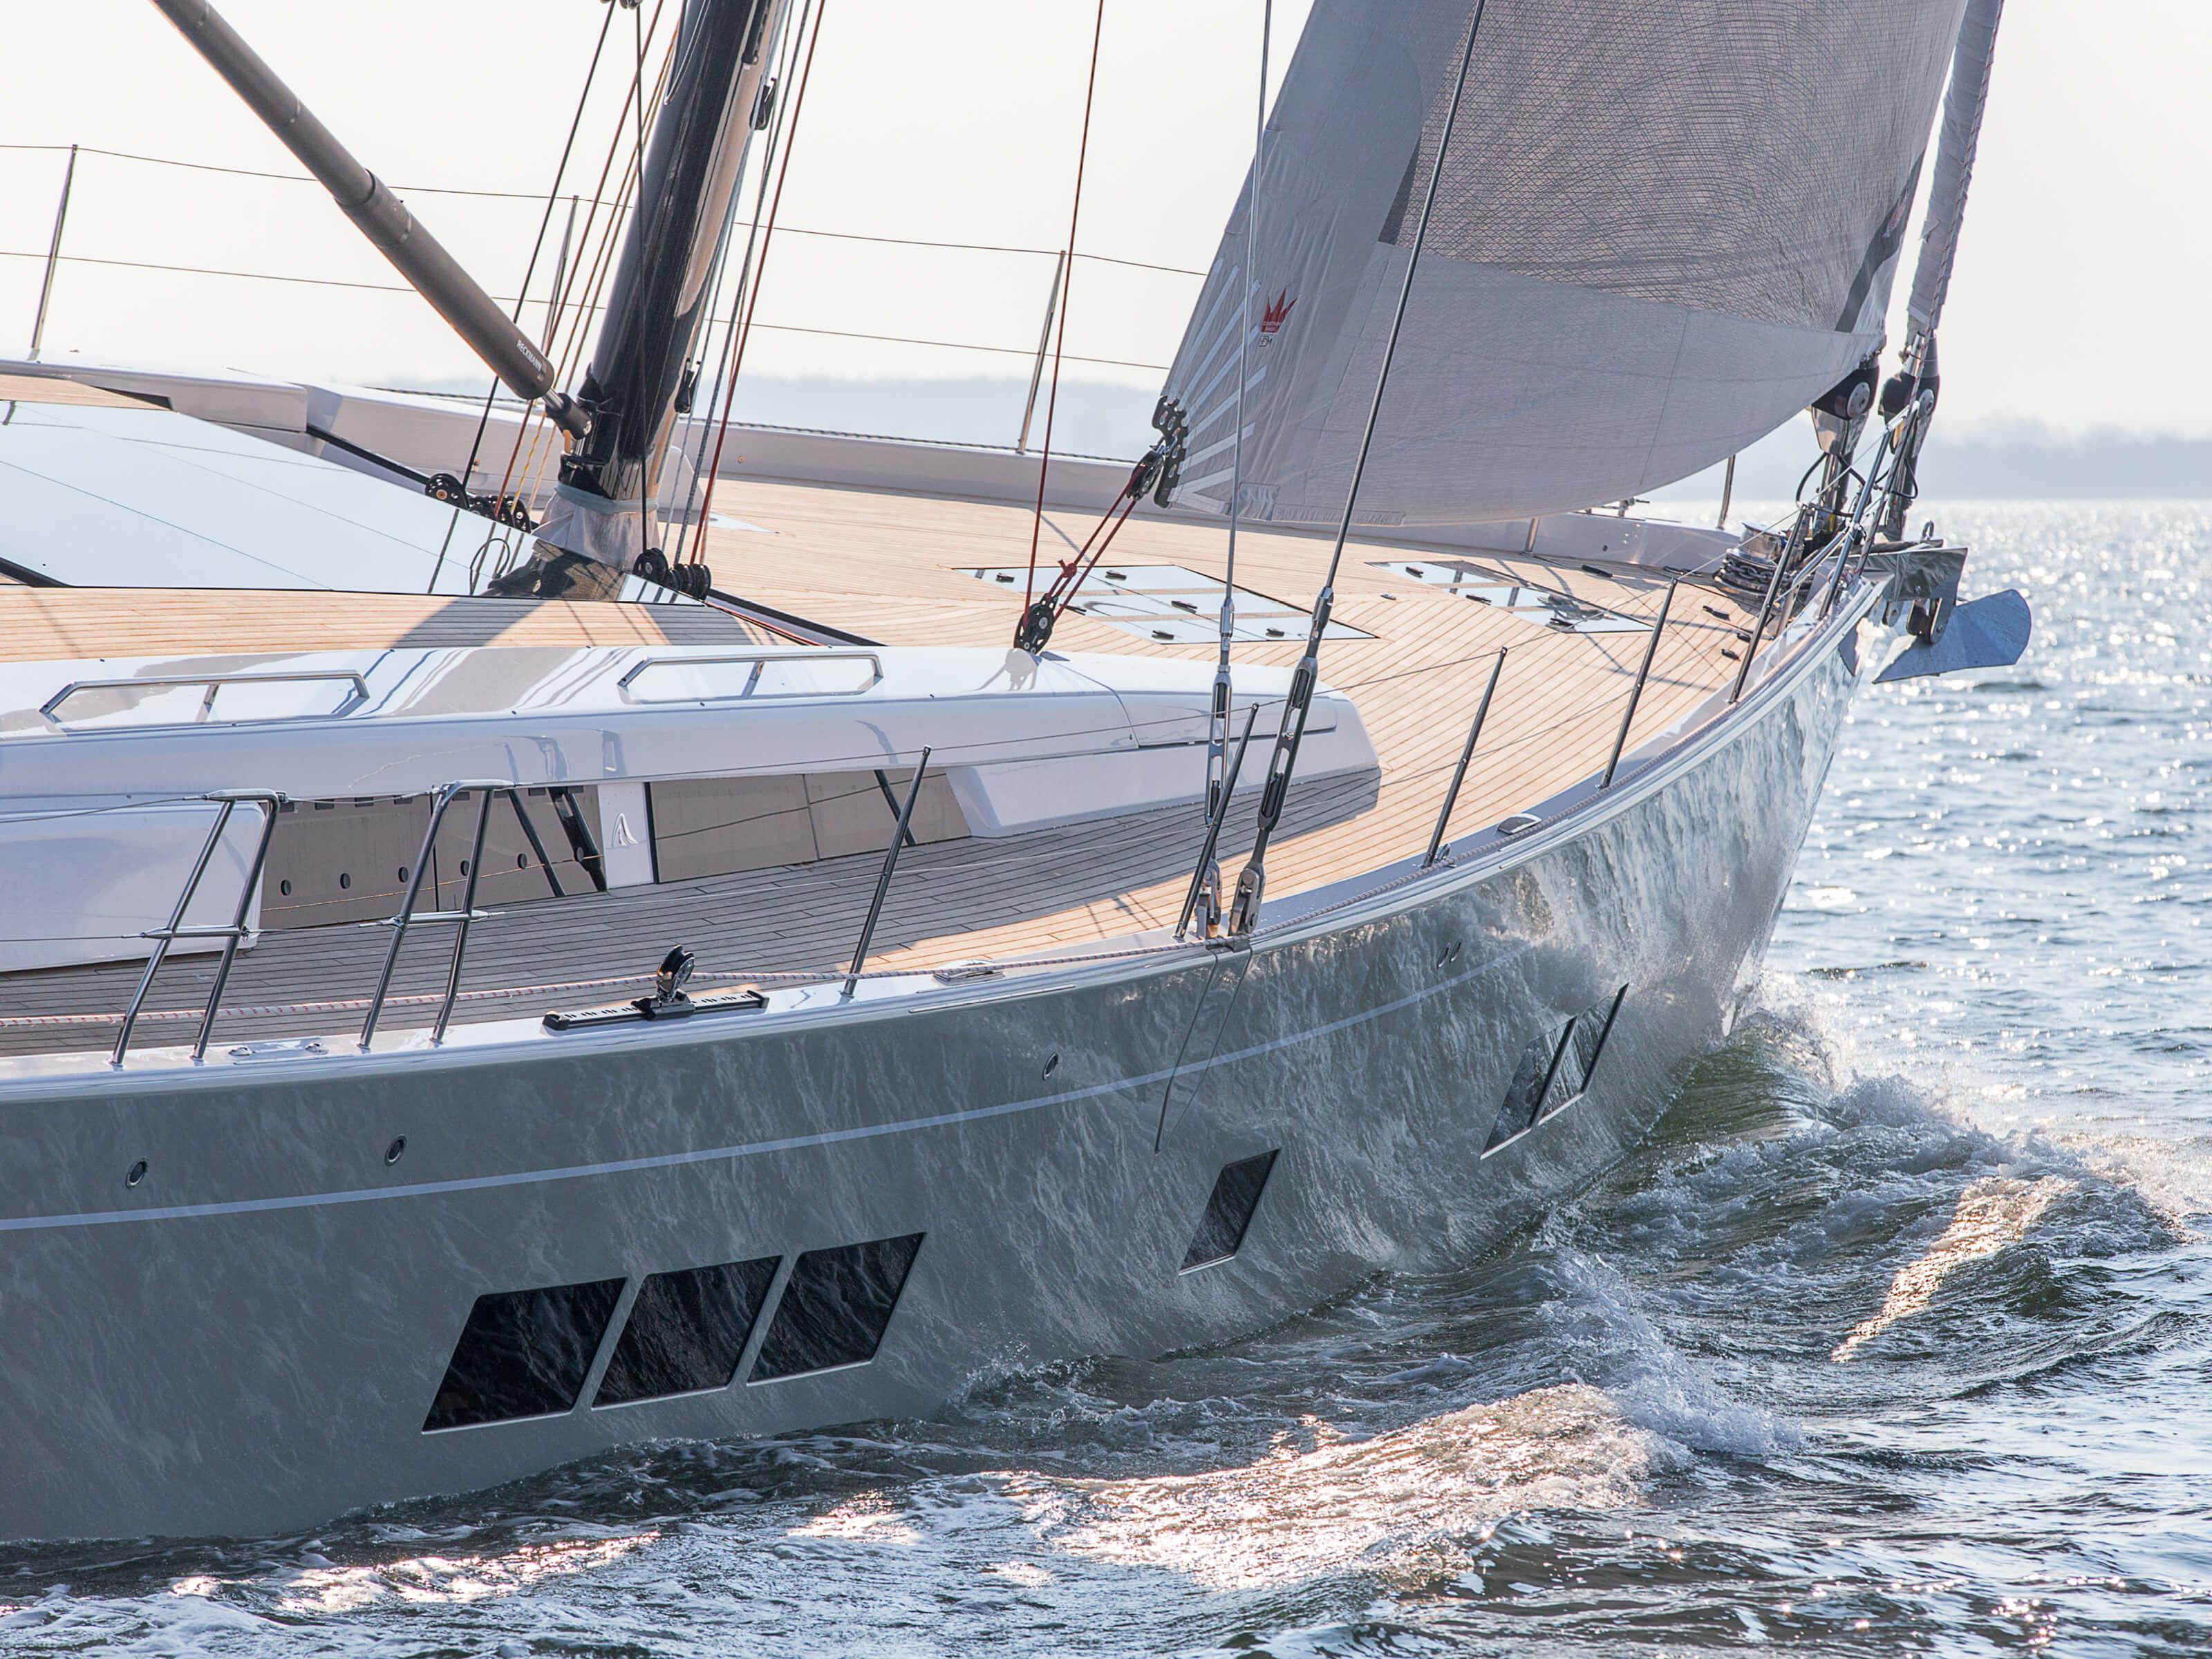 Hanse 675 | foresail, teak deck, anchor, foresail | Hanse